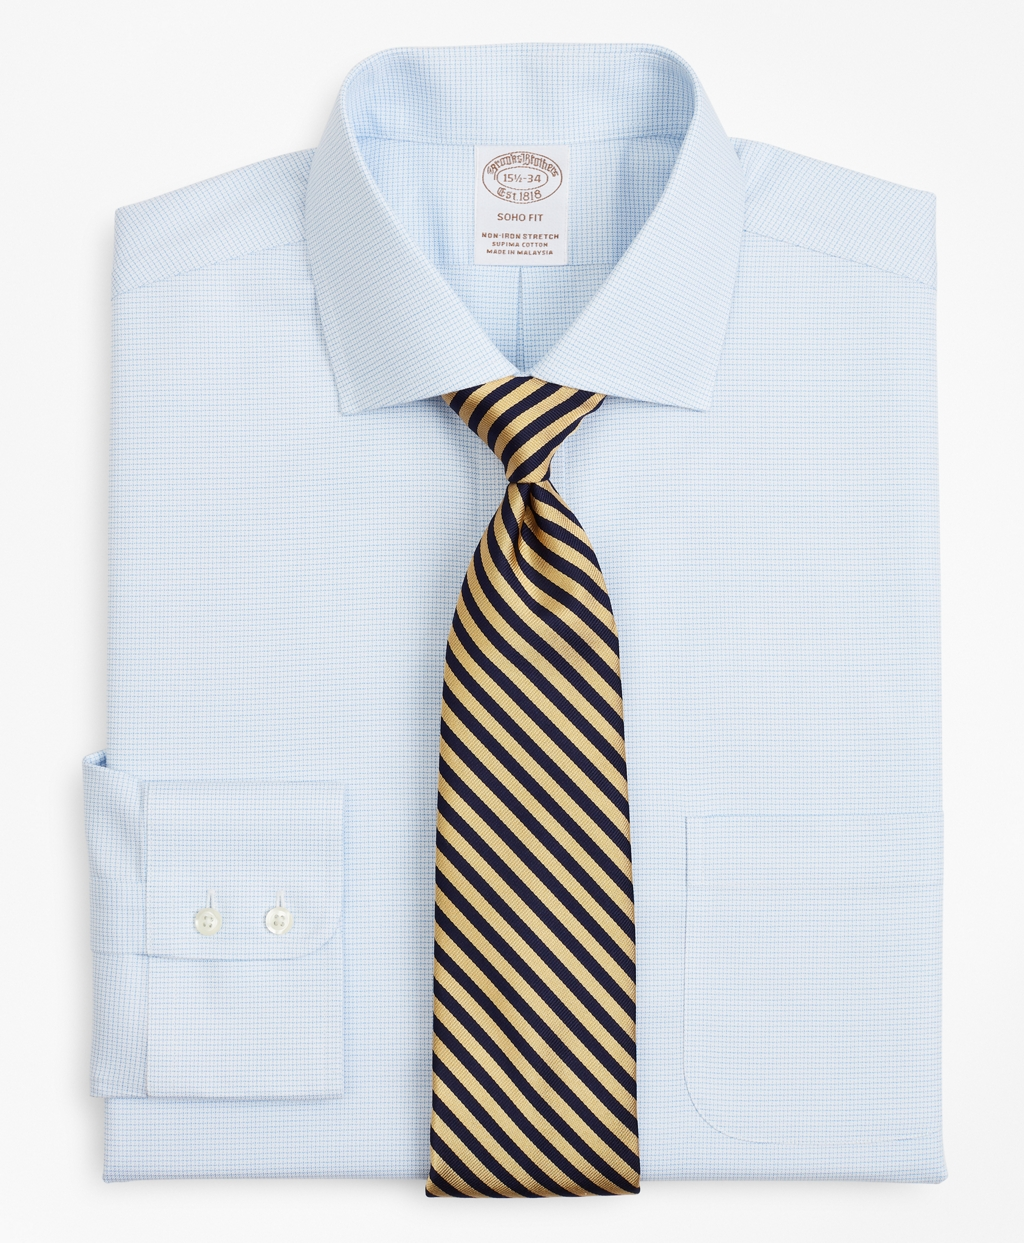 Brooksbrothers Stretch Soho Extra-Slim-Fit Dress Shirt, Non-Iron Twill English Collar Micro-Check